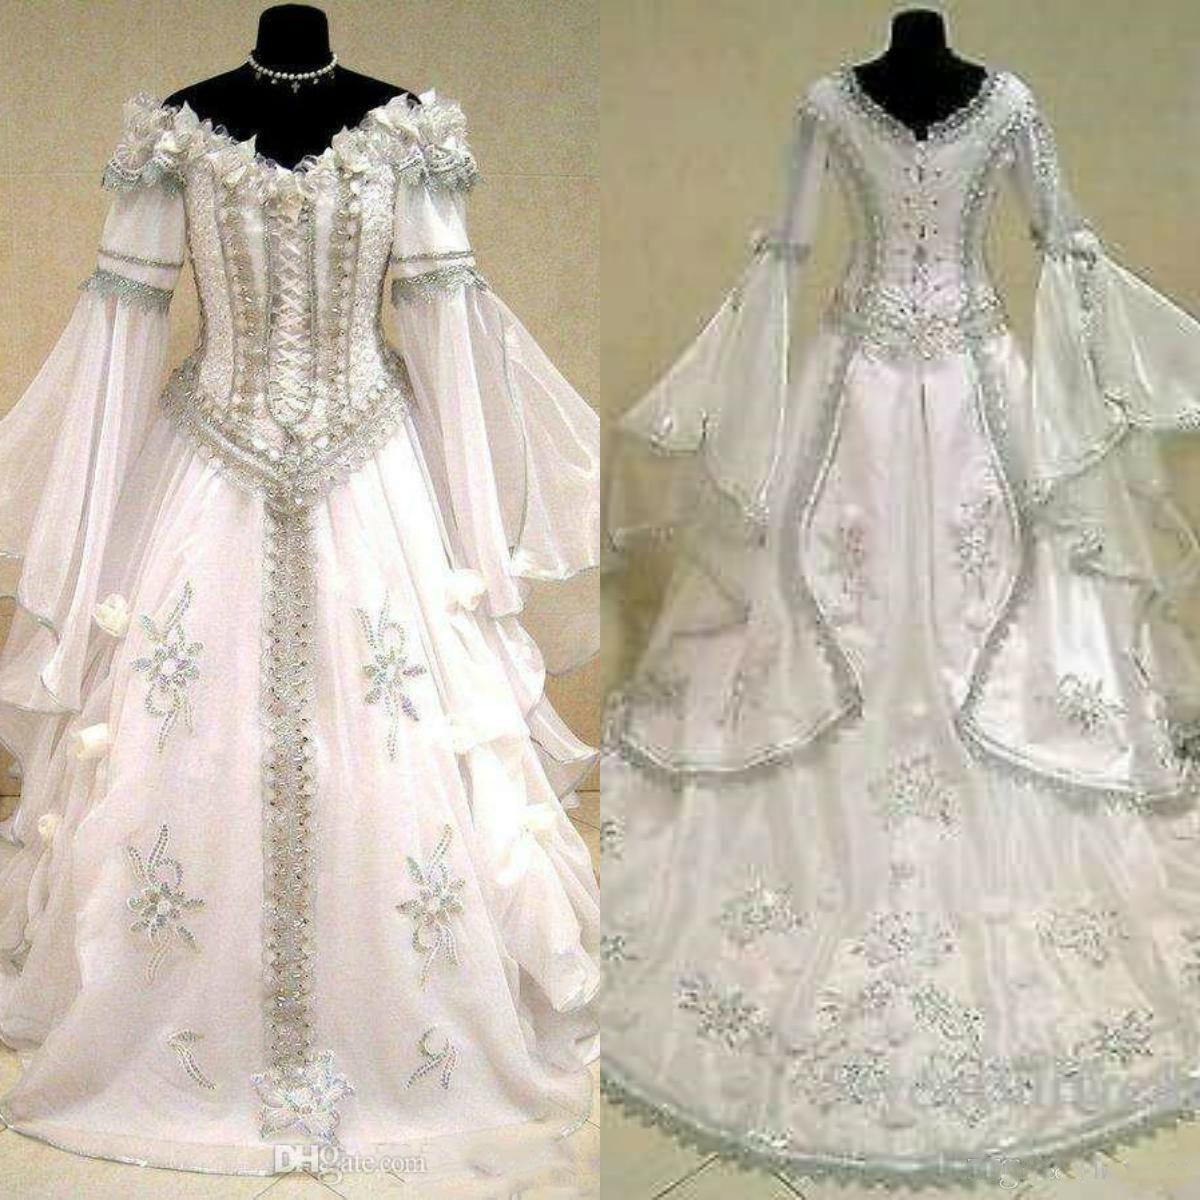 Medieval Wedding Dresses Witch Celtic Tudor Renaissance Costume Victorian Gothic Off The Shoulder Long Sleeve Wedding Dress Bridal Gowns